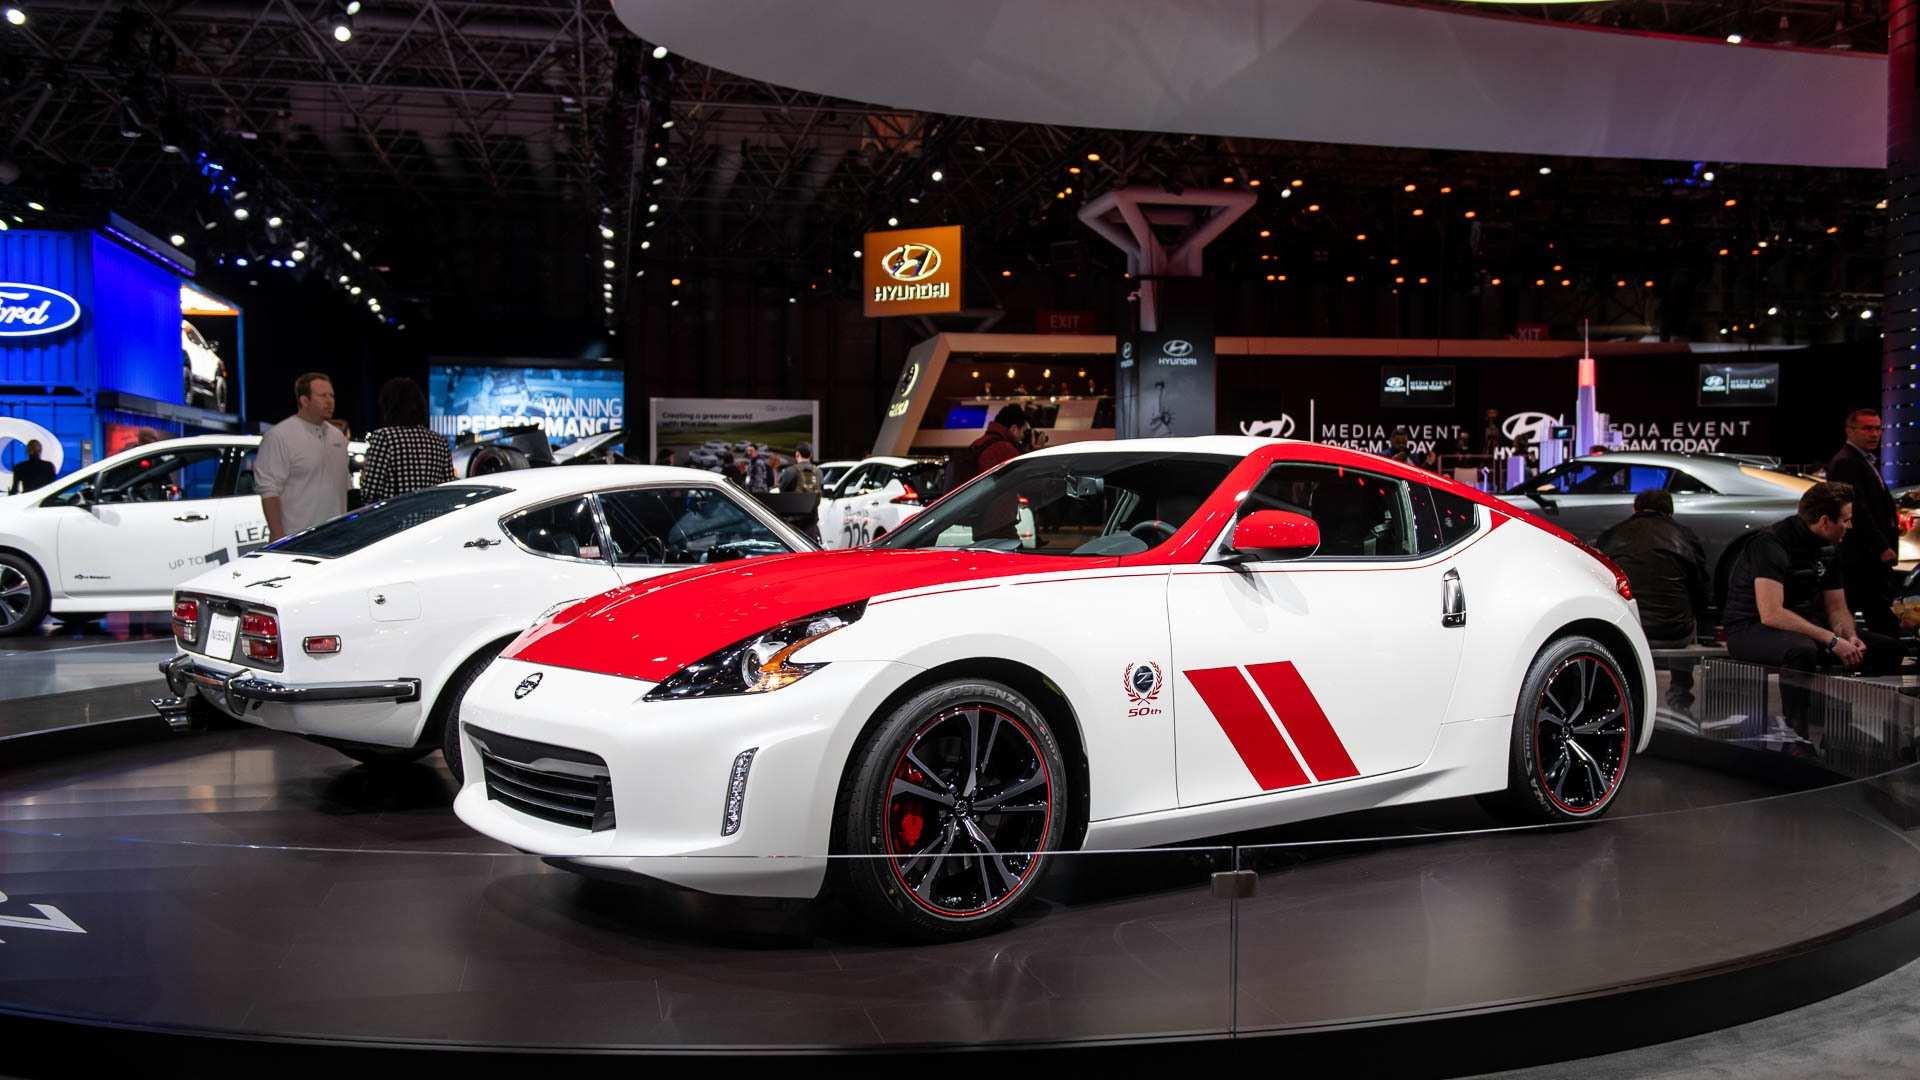 49 Gallery of Nissan Z Car 2020 Photos by Nissan Z Car 2020